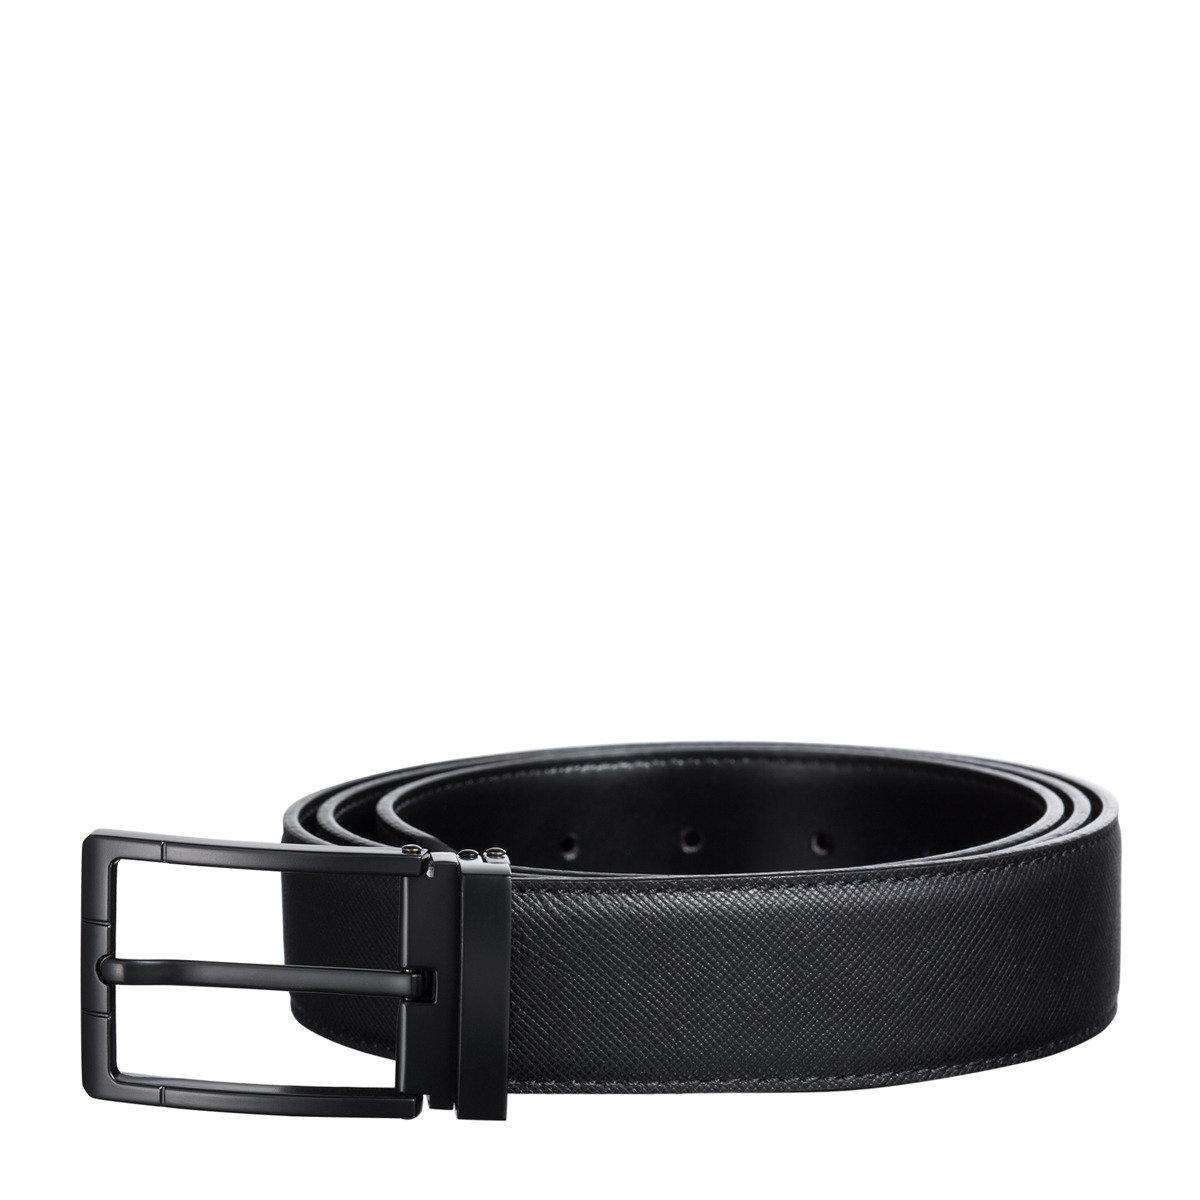 Saffiano 牛皮時尚針扣皮帶